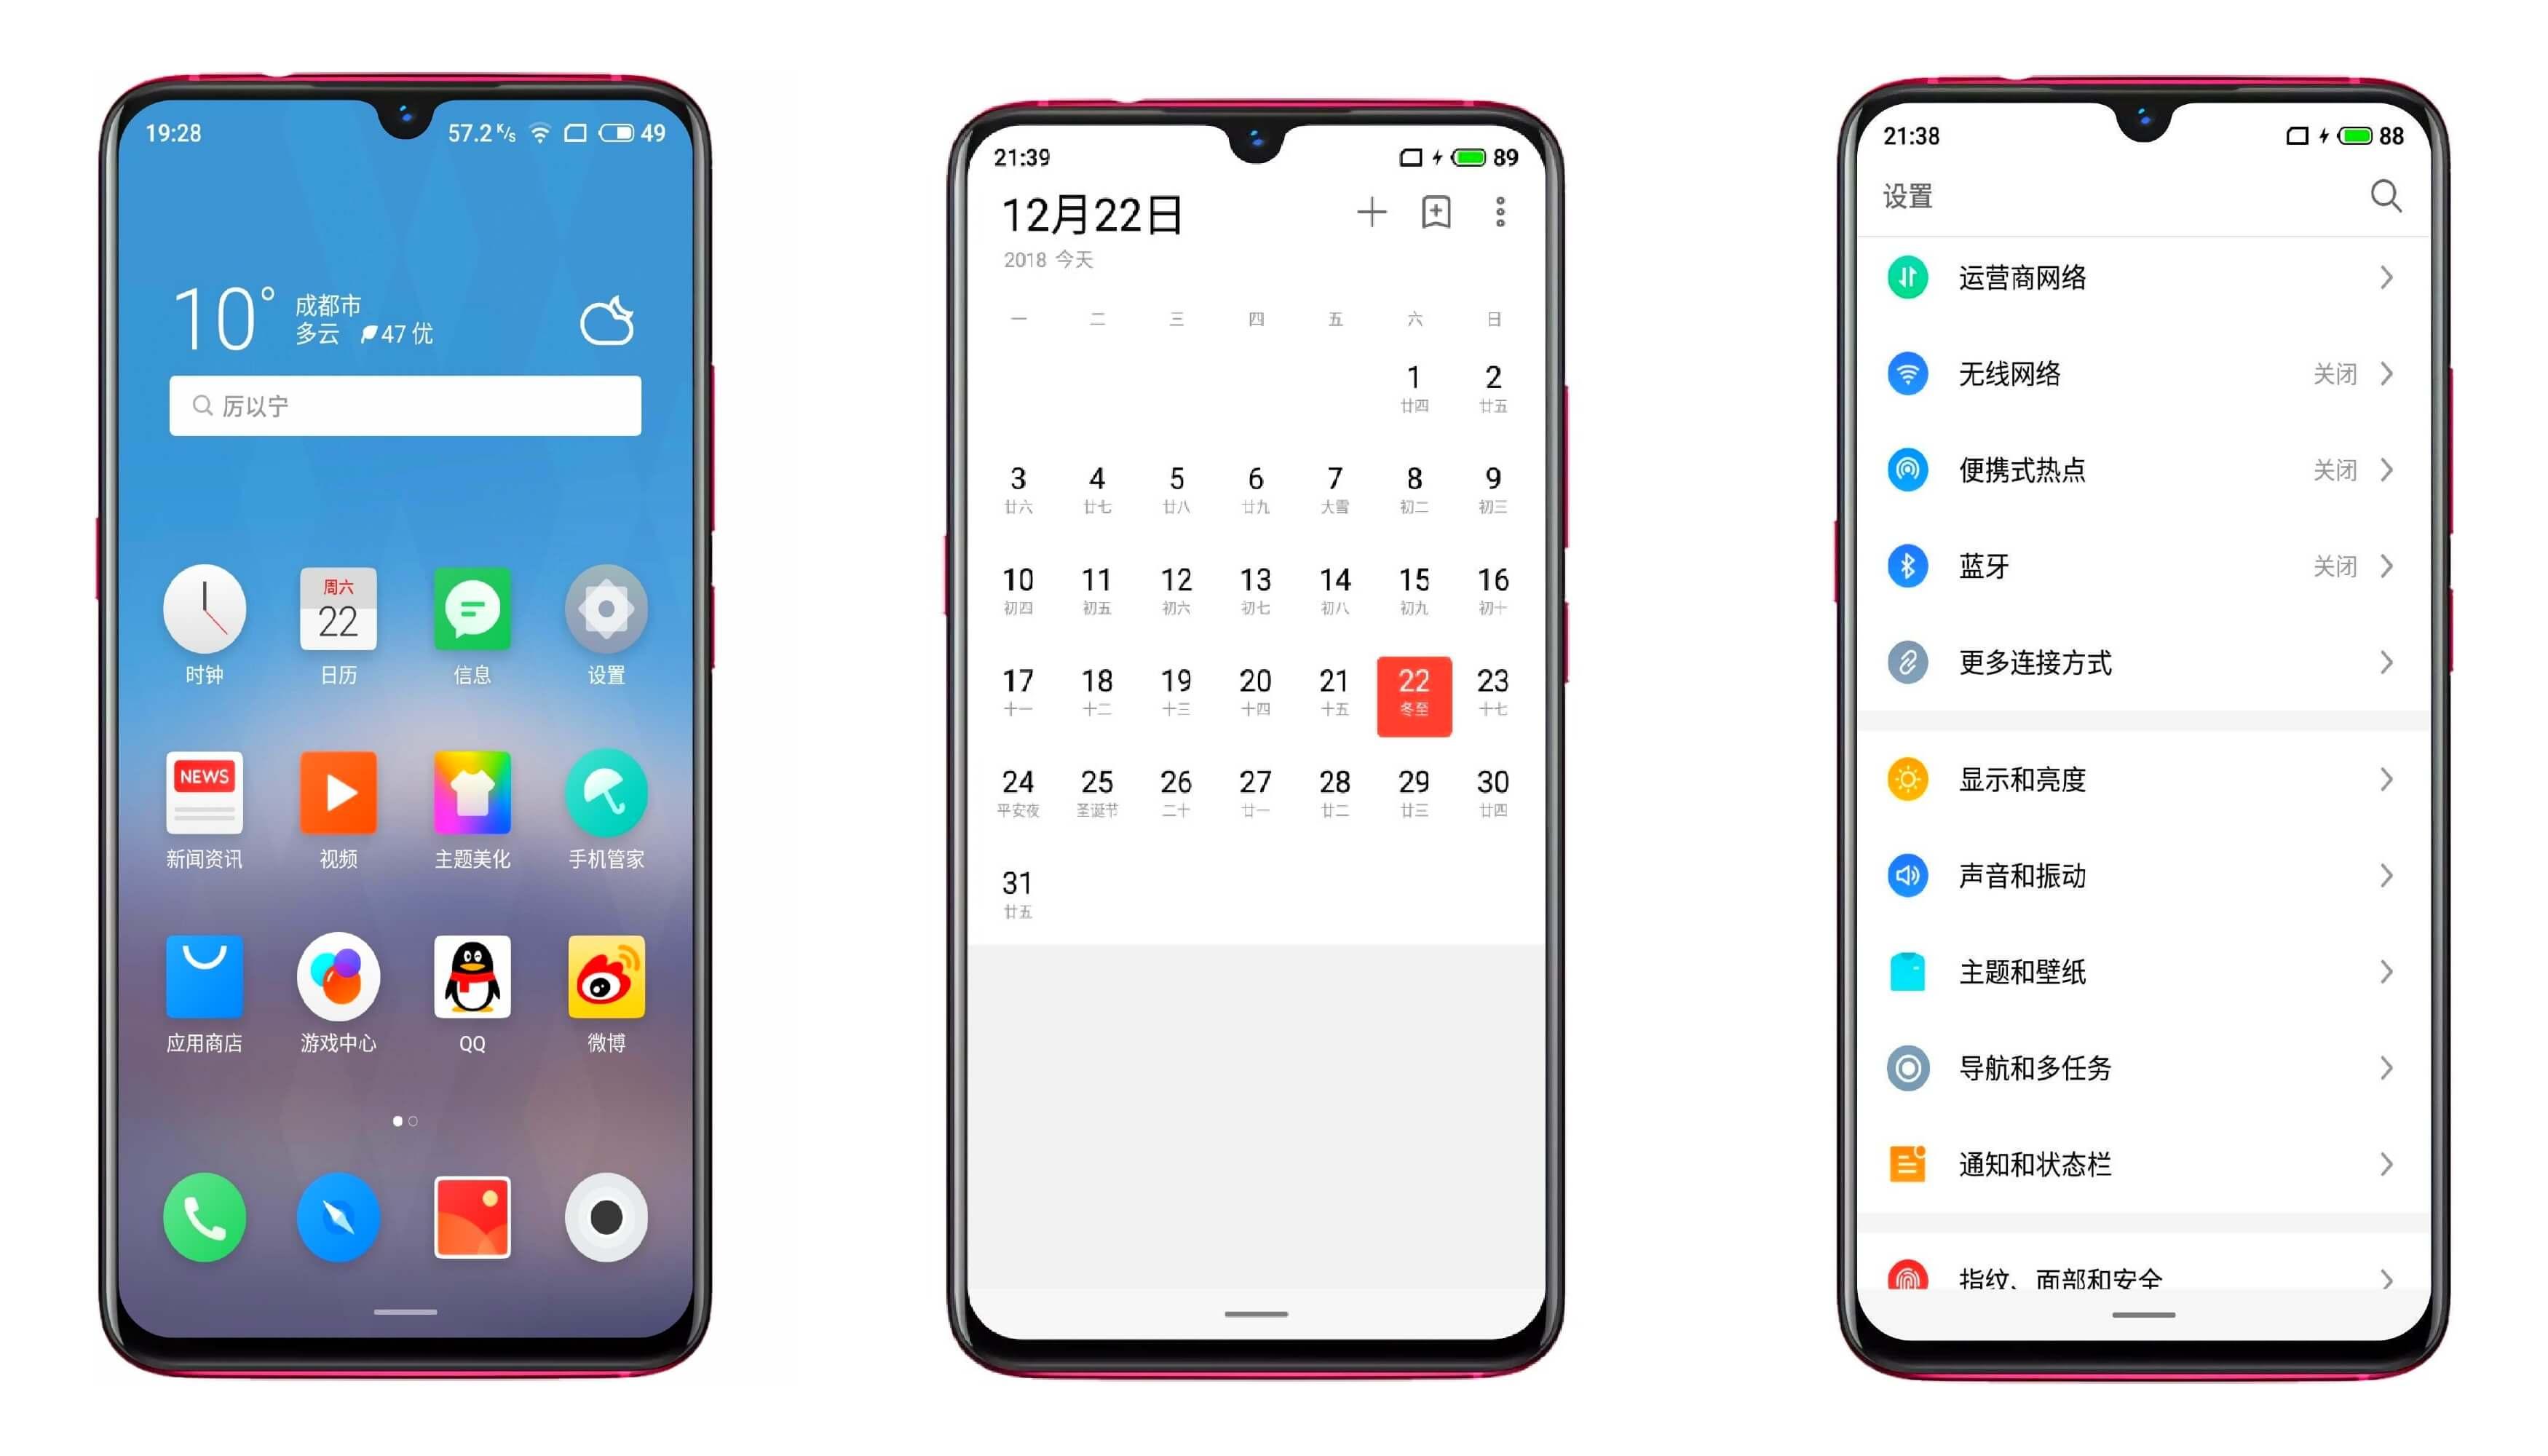 Rivelate online le caratteristiche del Meizu Note 9 thumbnail